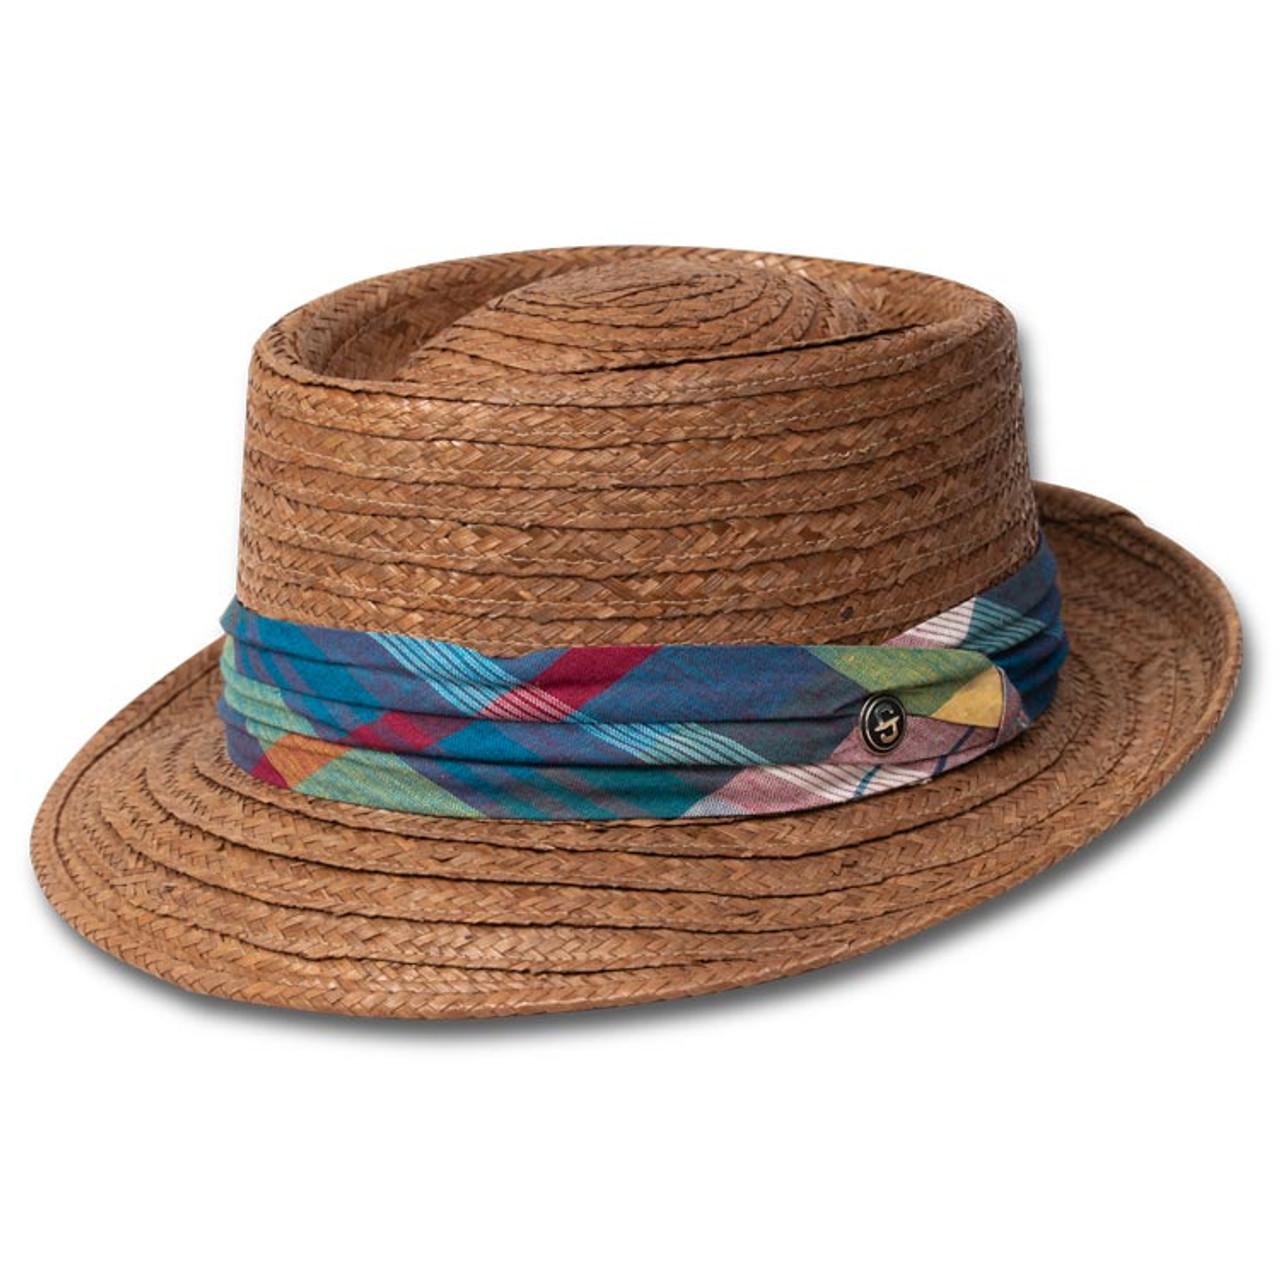 957828b1482385 Stetson | Madrigal Coconut Braid Gadabout | Hats Unlimited